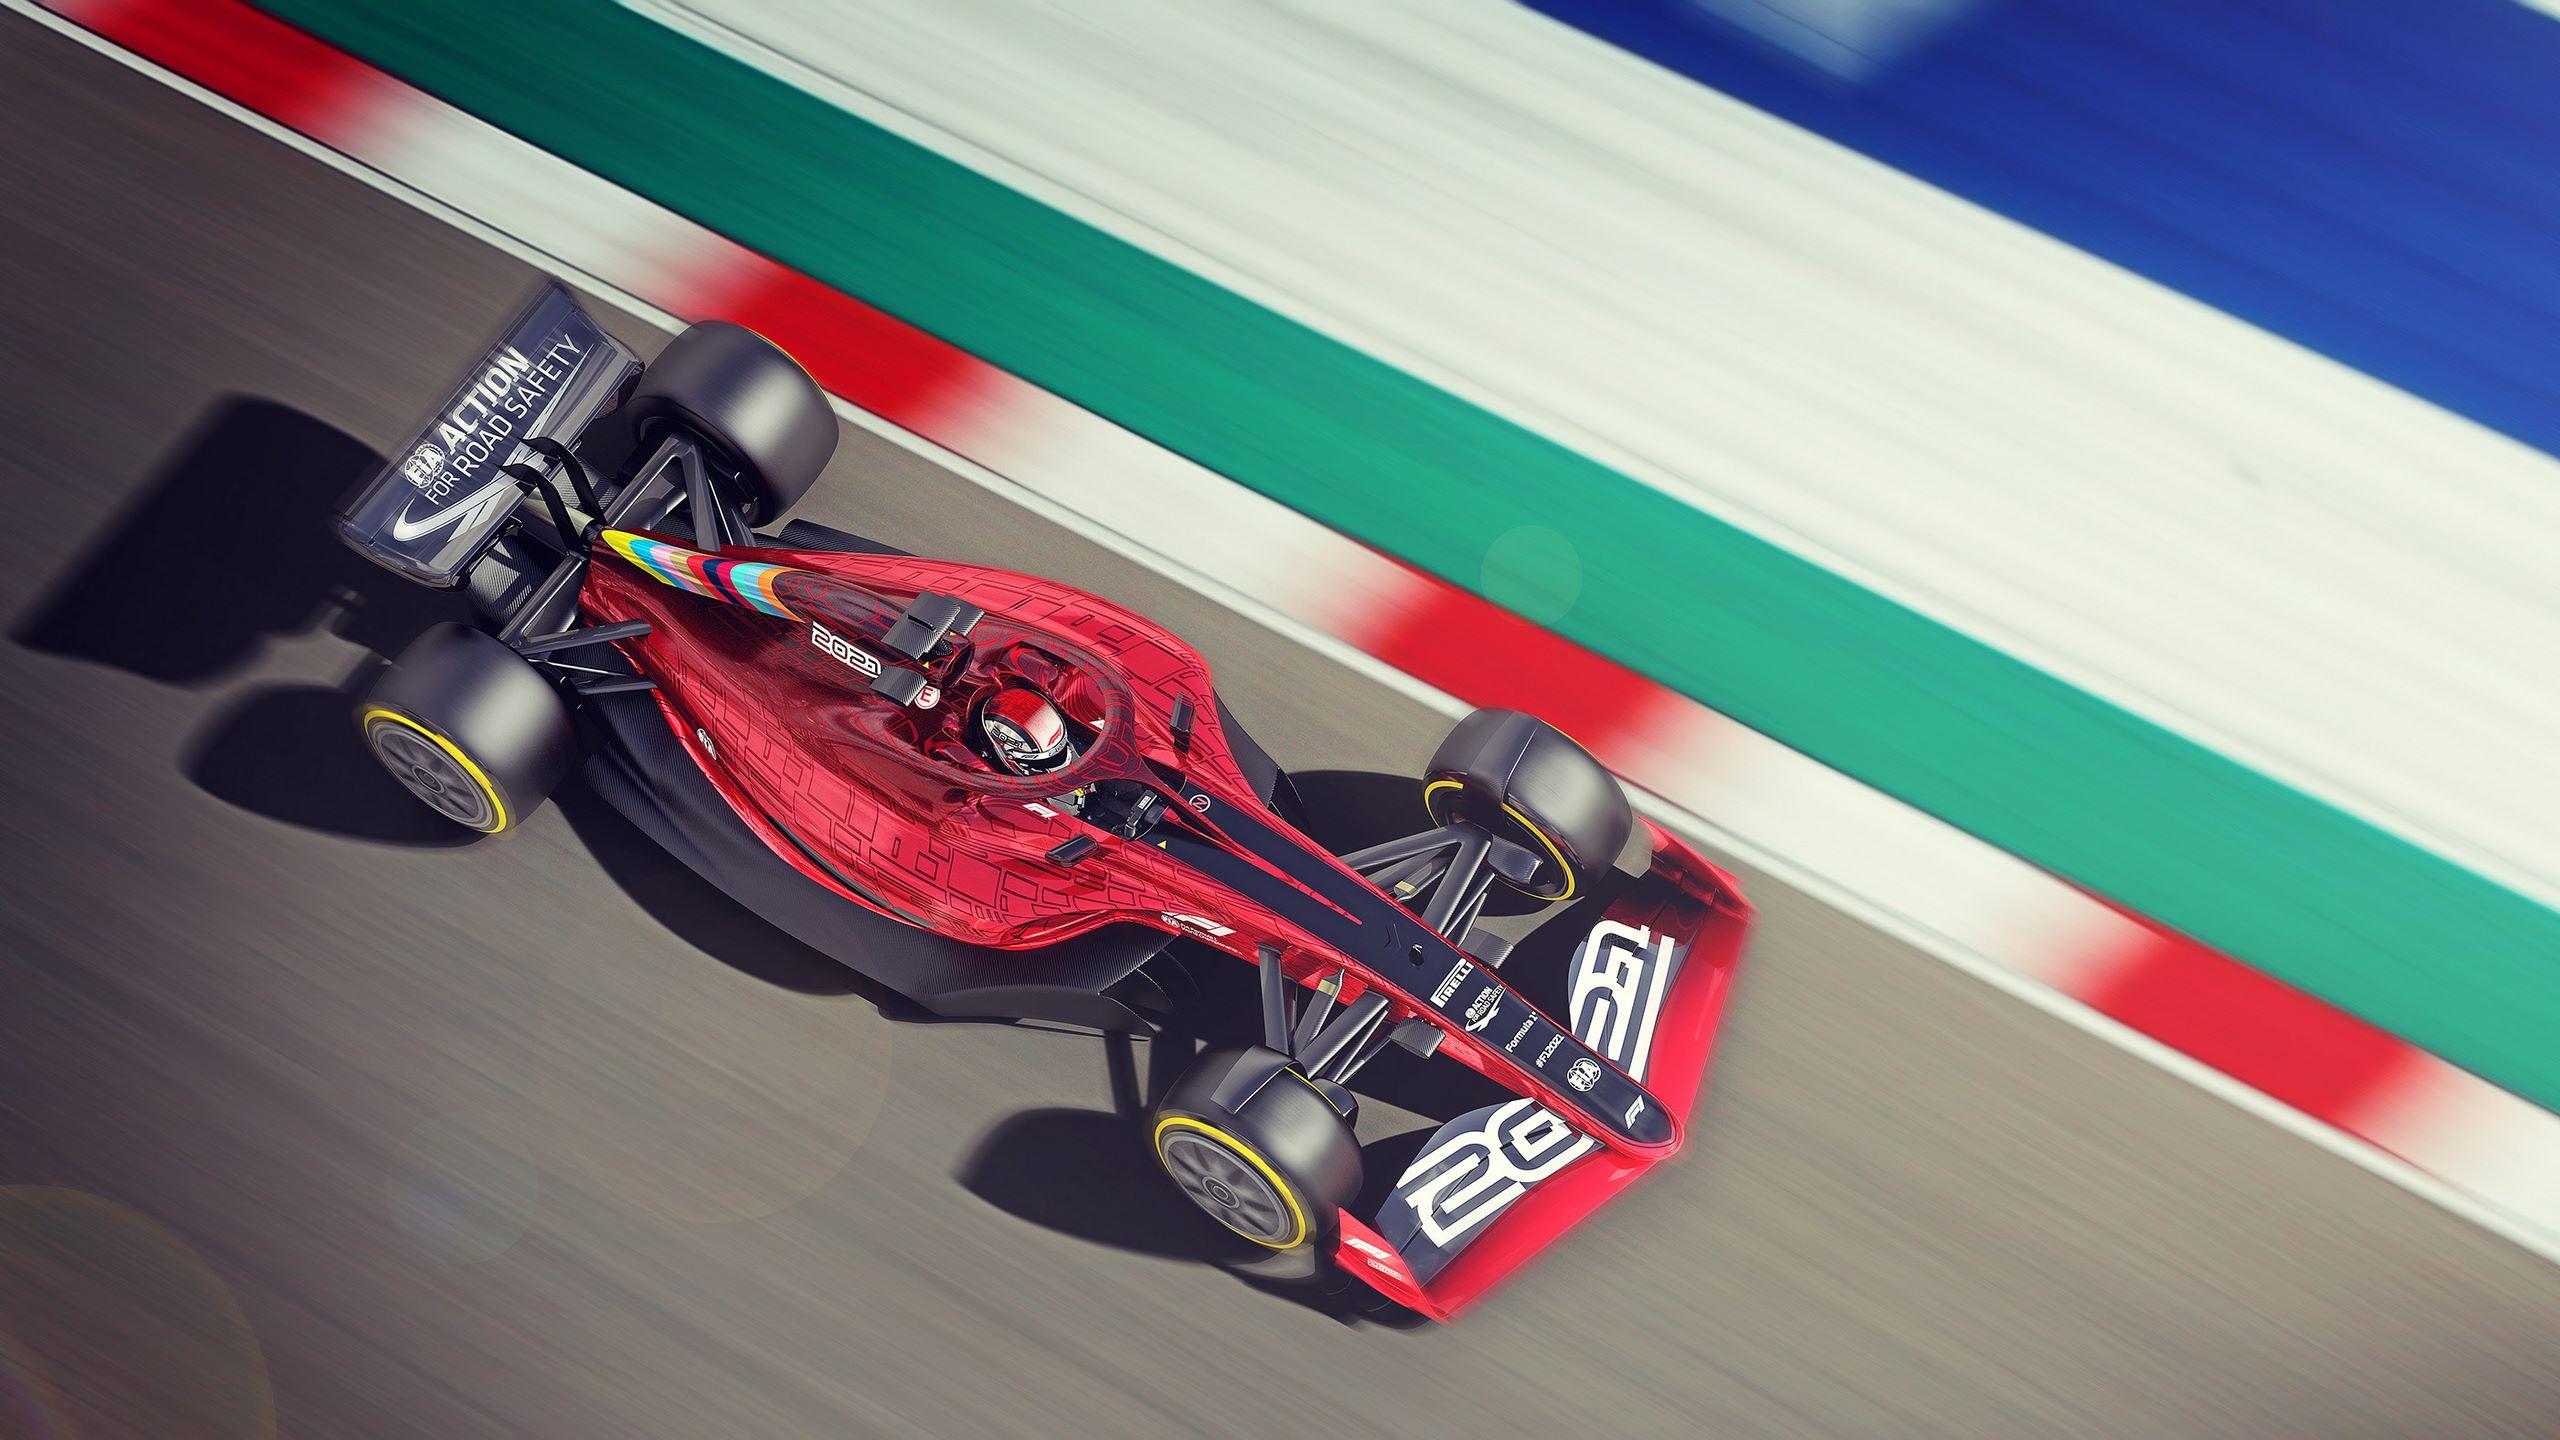 2021-formula-1-race-car-rendering f1 (9)